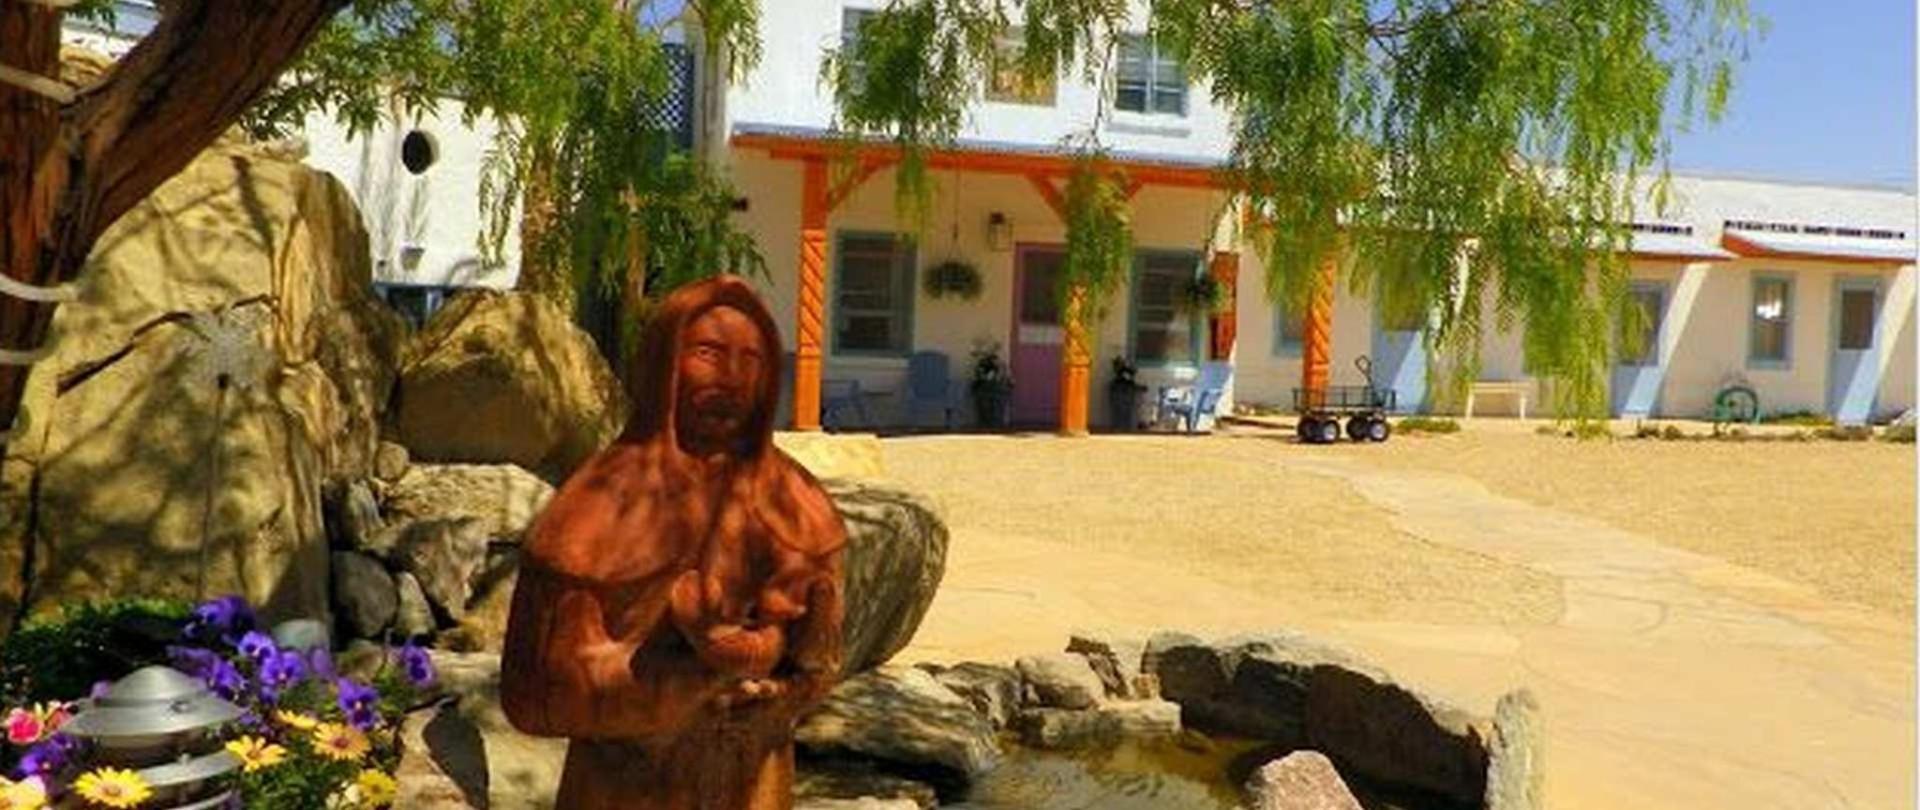 La Paloma Hot Springs